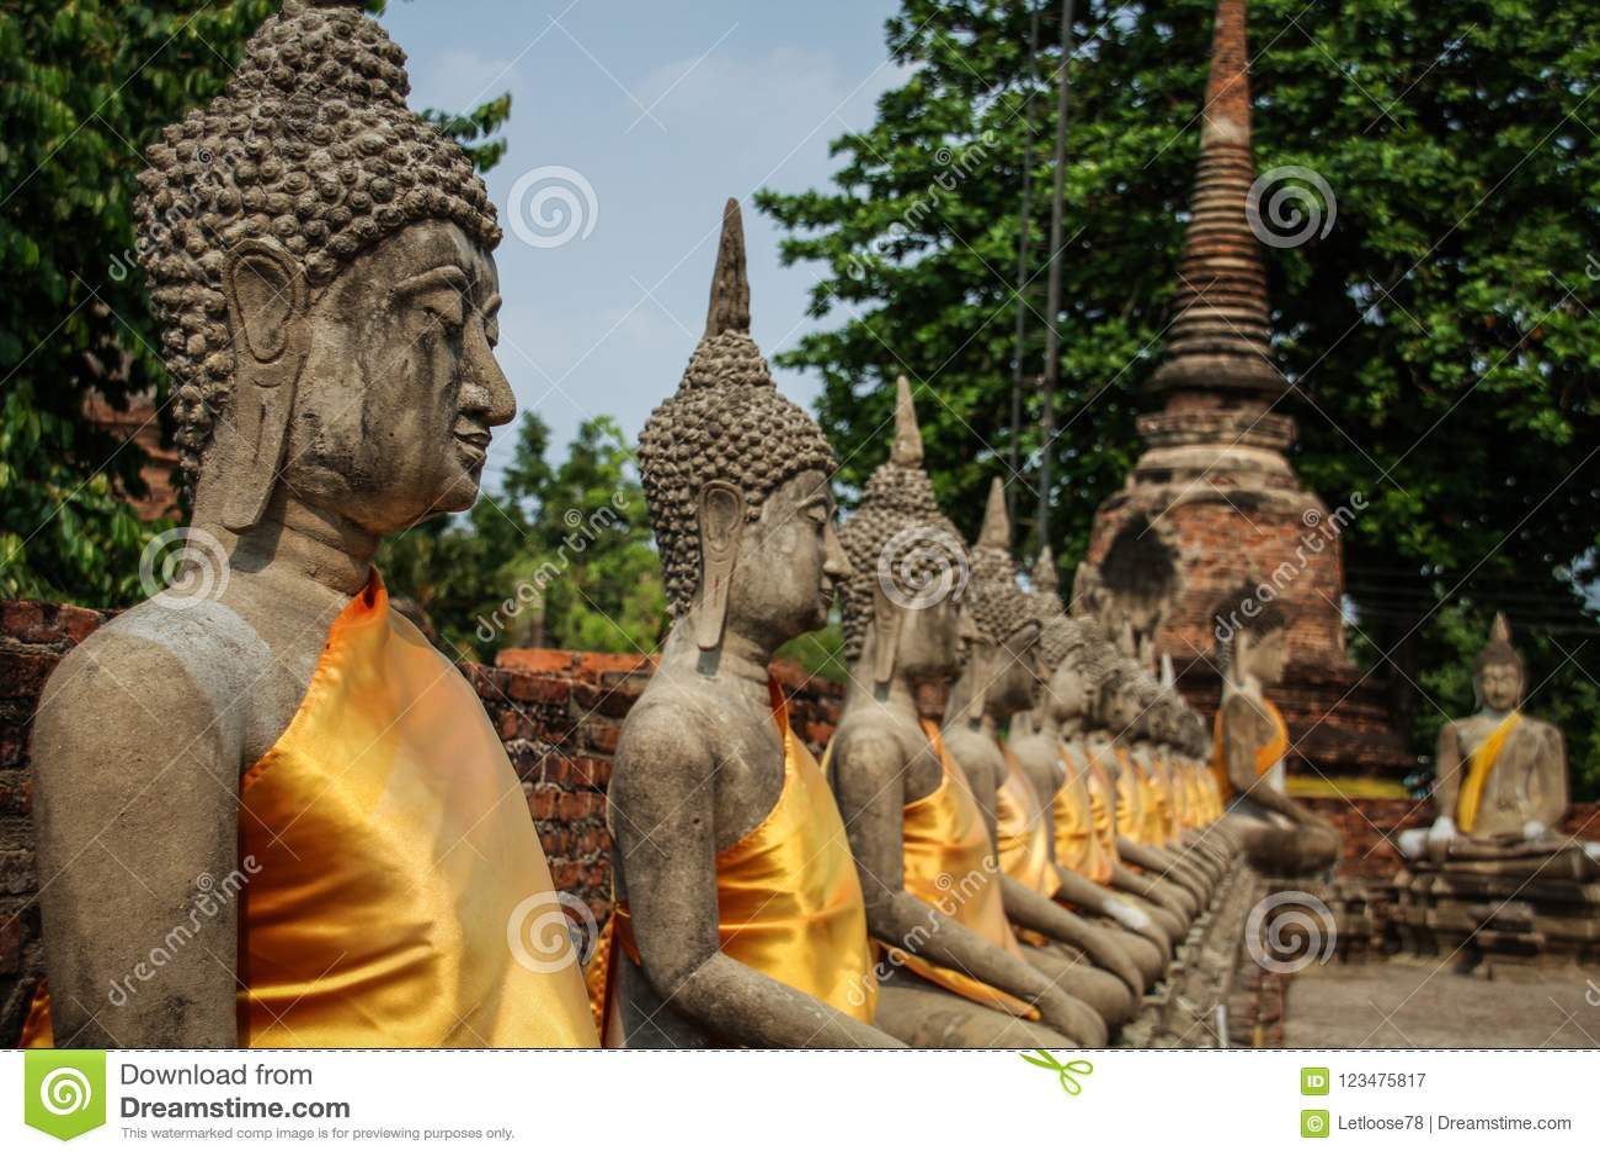 Buddha-Statuenausrichtung an Wat Yai Chai Mongkhon-Tempel, Ayutthaya, Chao Phraya Basin, Mittel-Thailand, Thailand